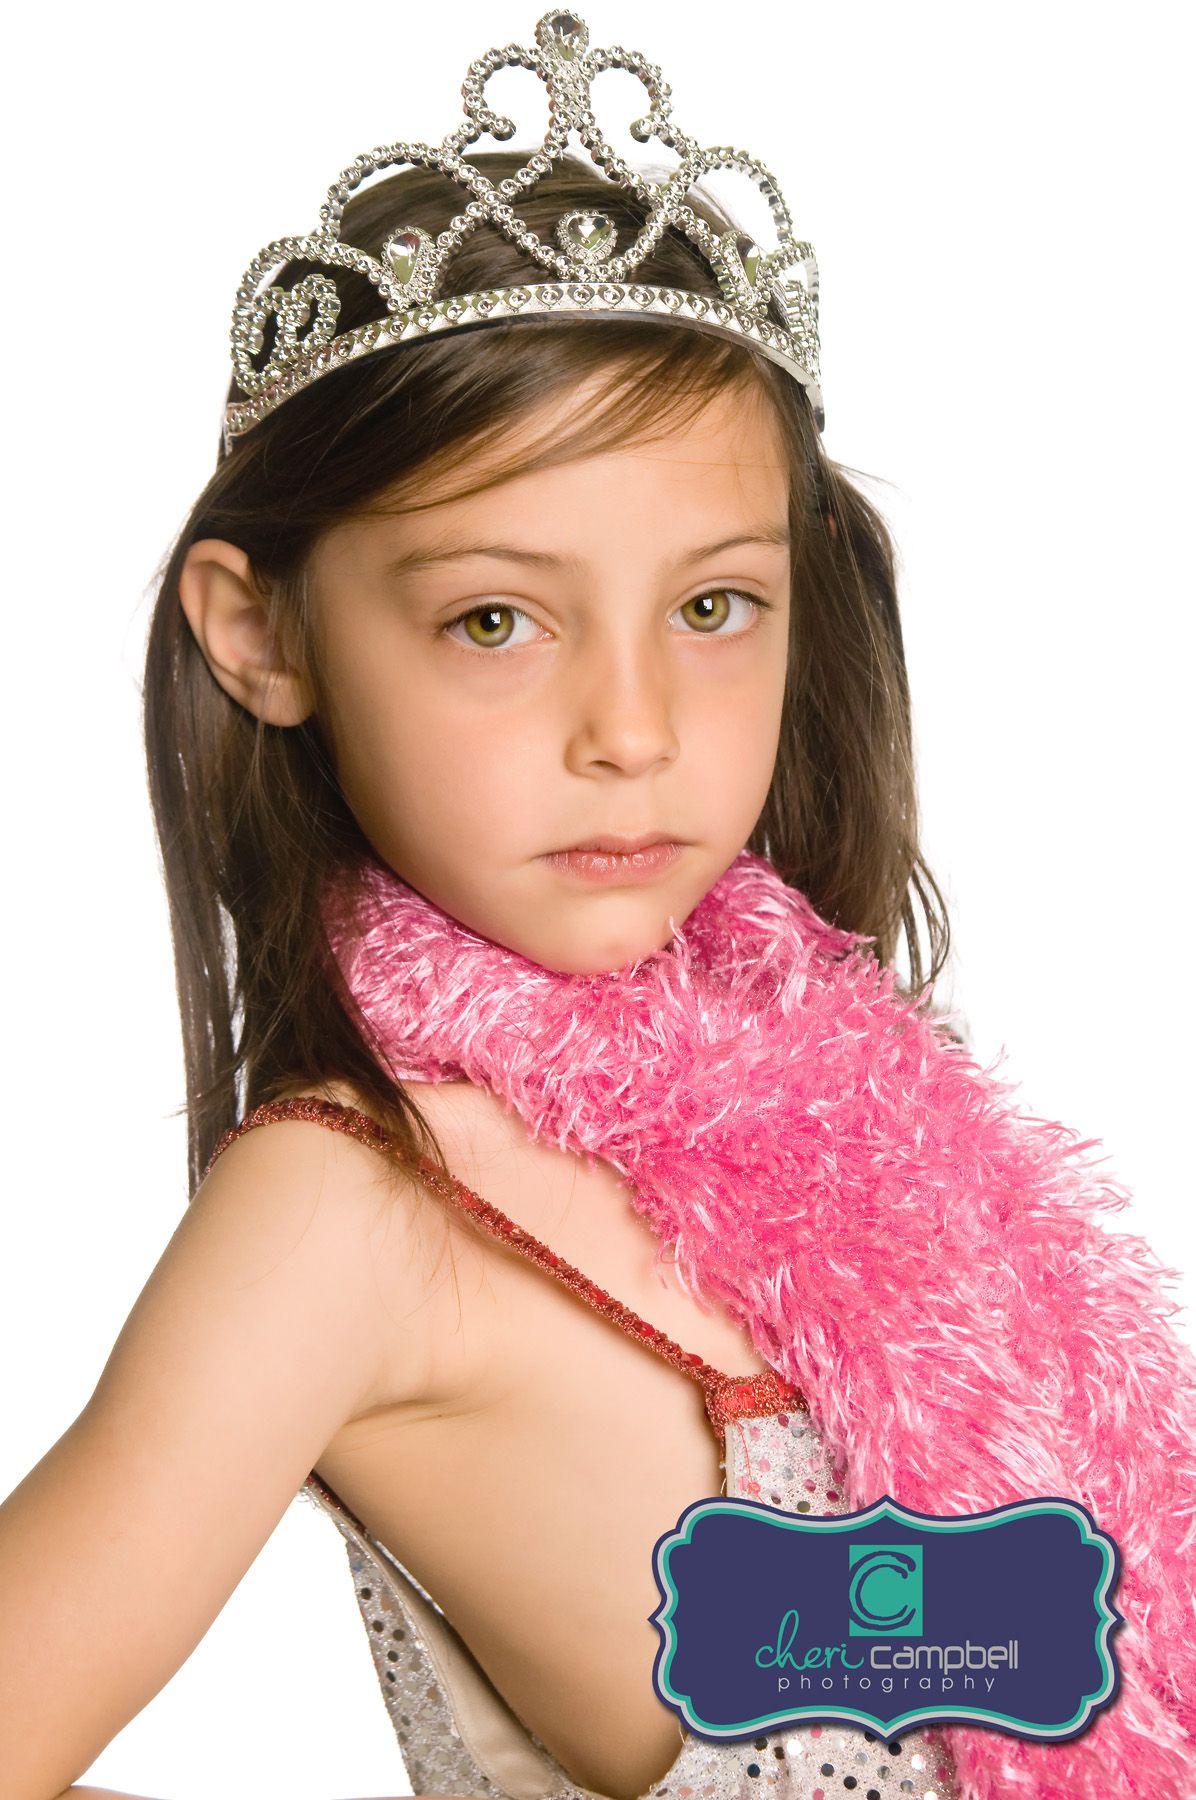 Childrens photography Childrens photography, Special fx